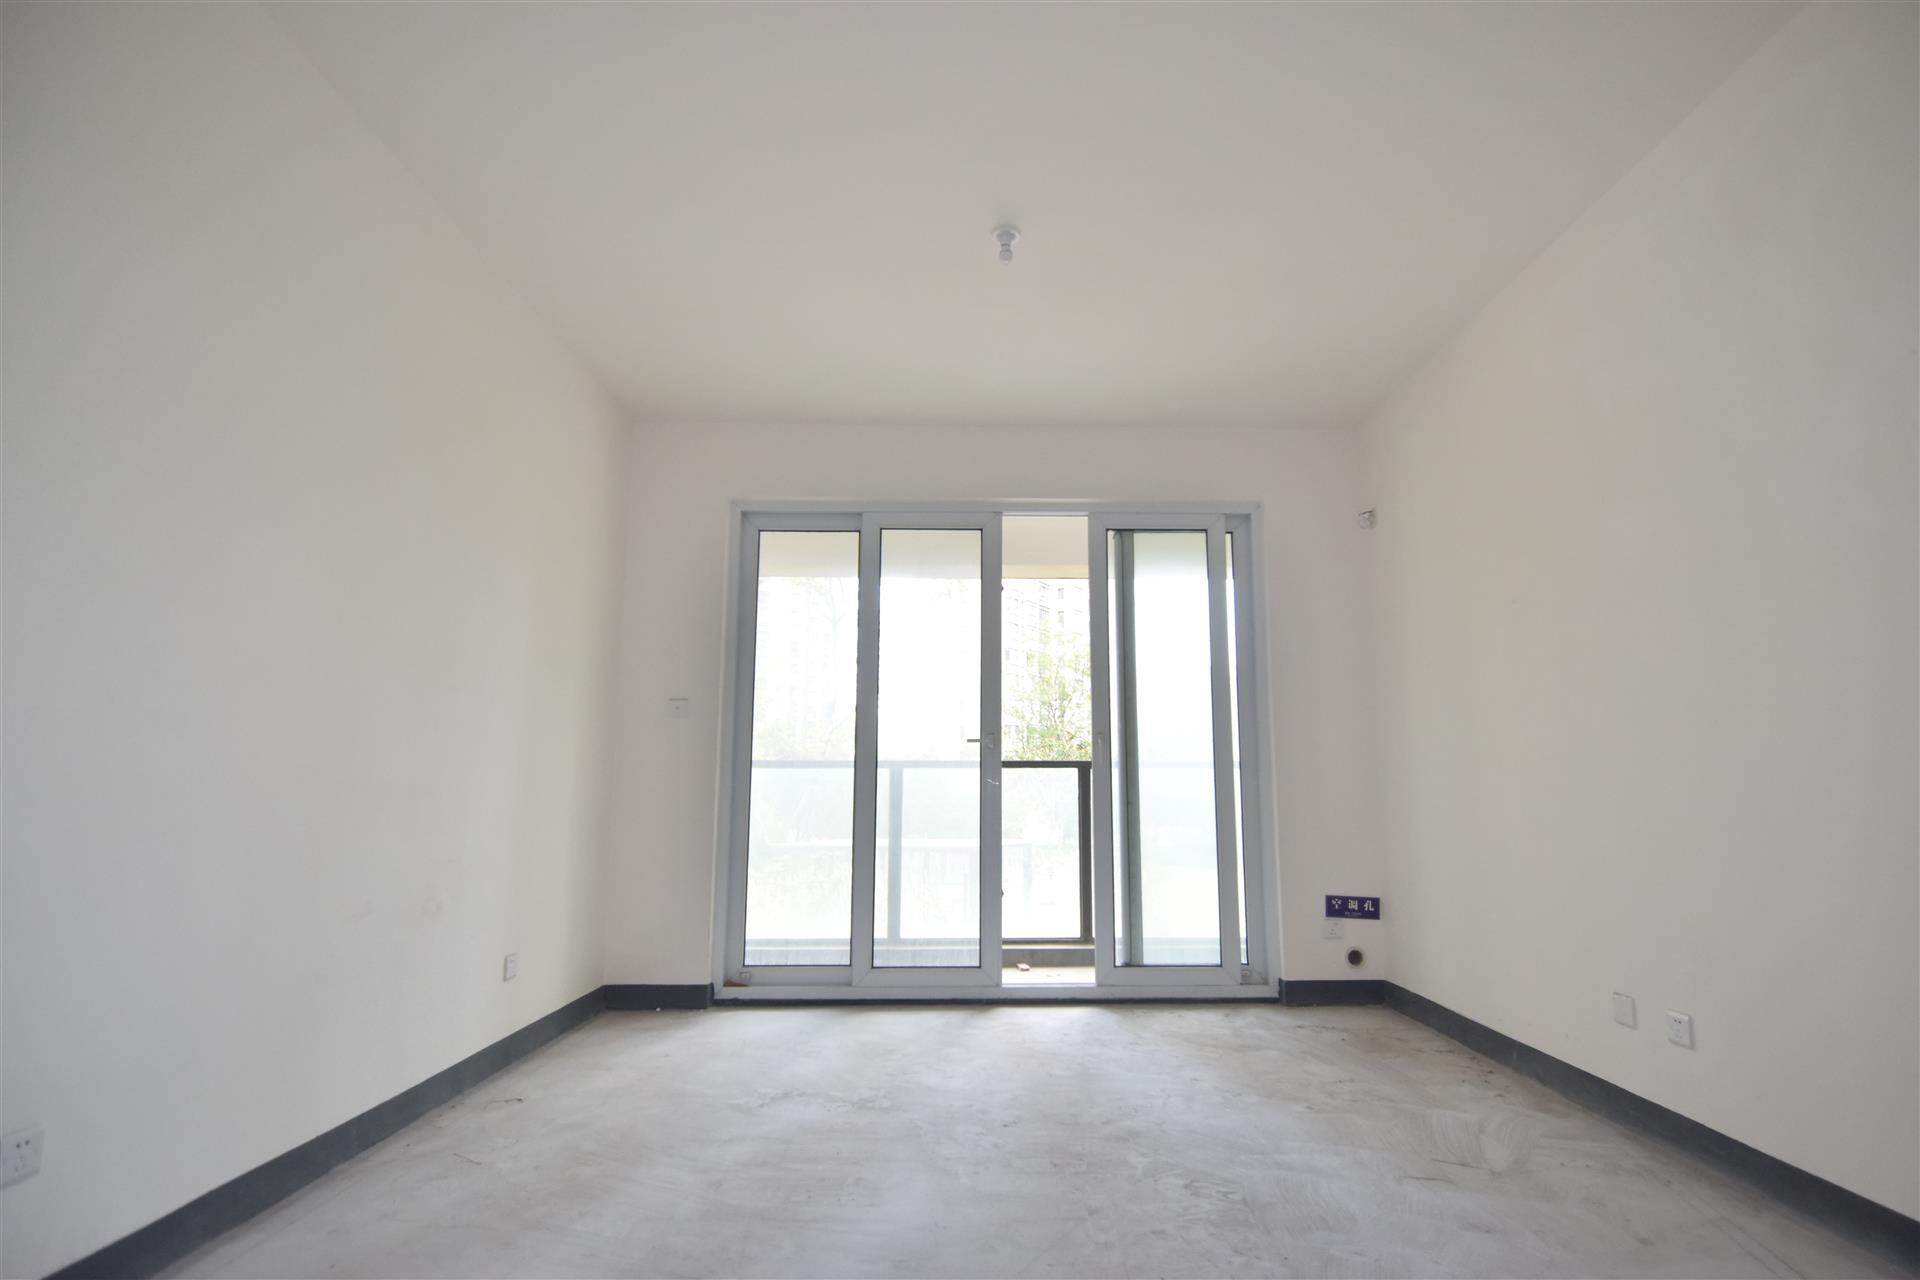 保利中央公园3室2厅